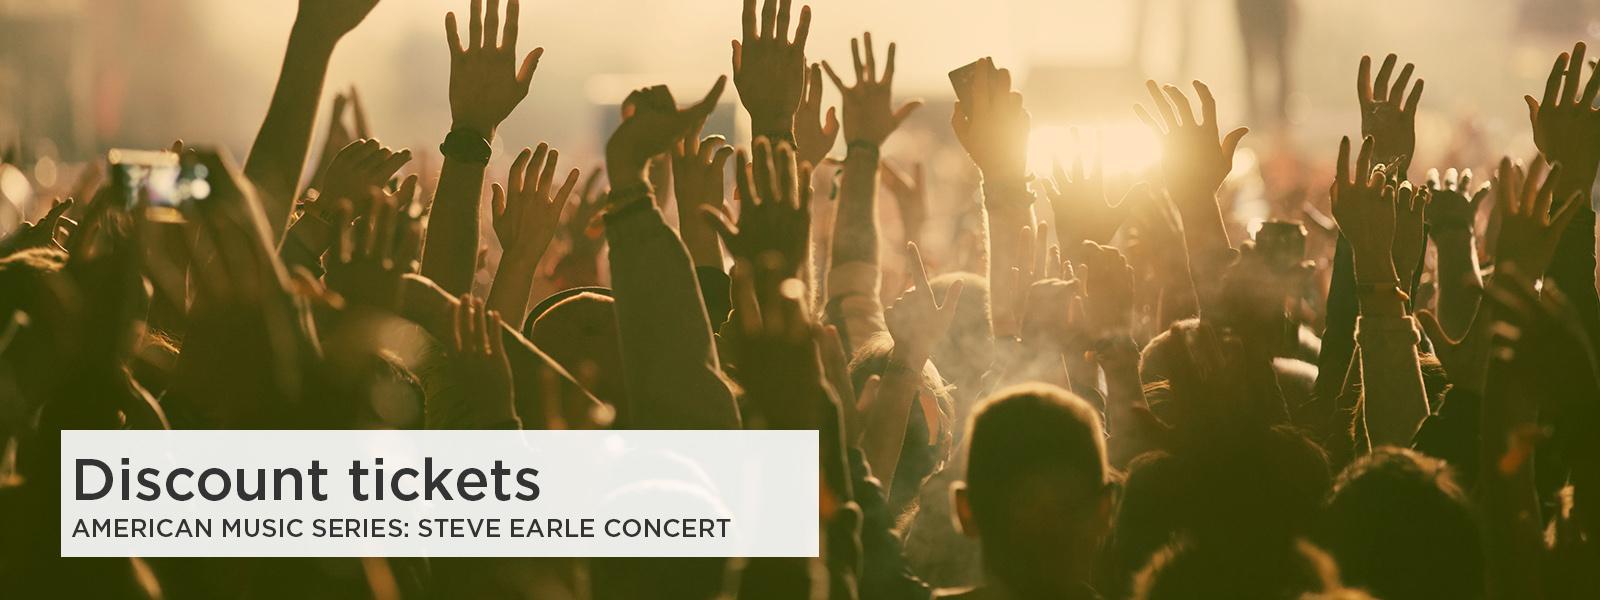 Steve Earle Concert